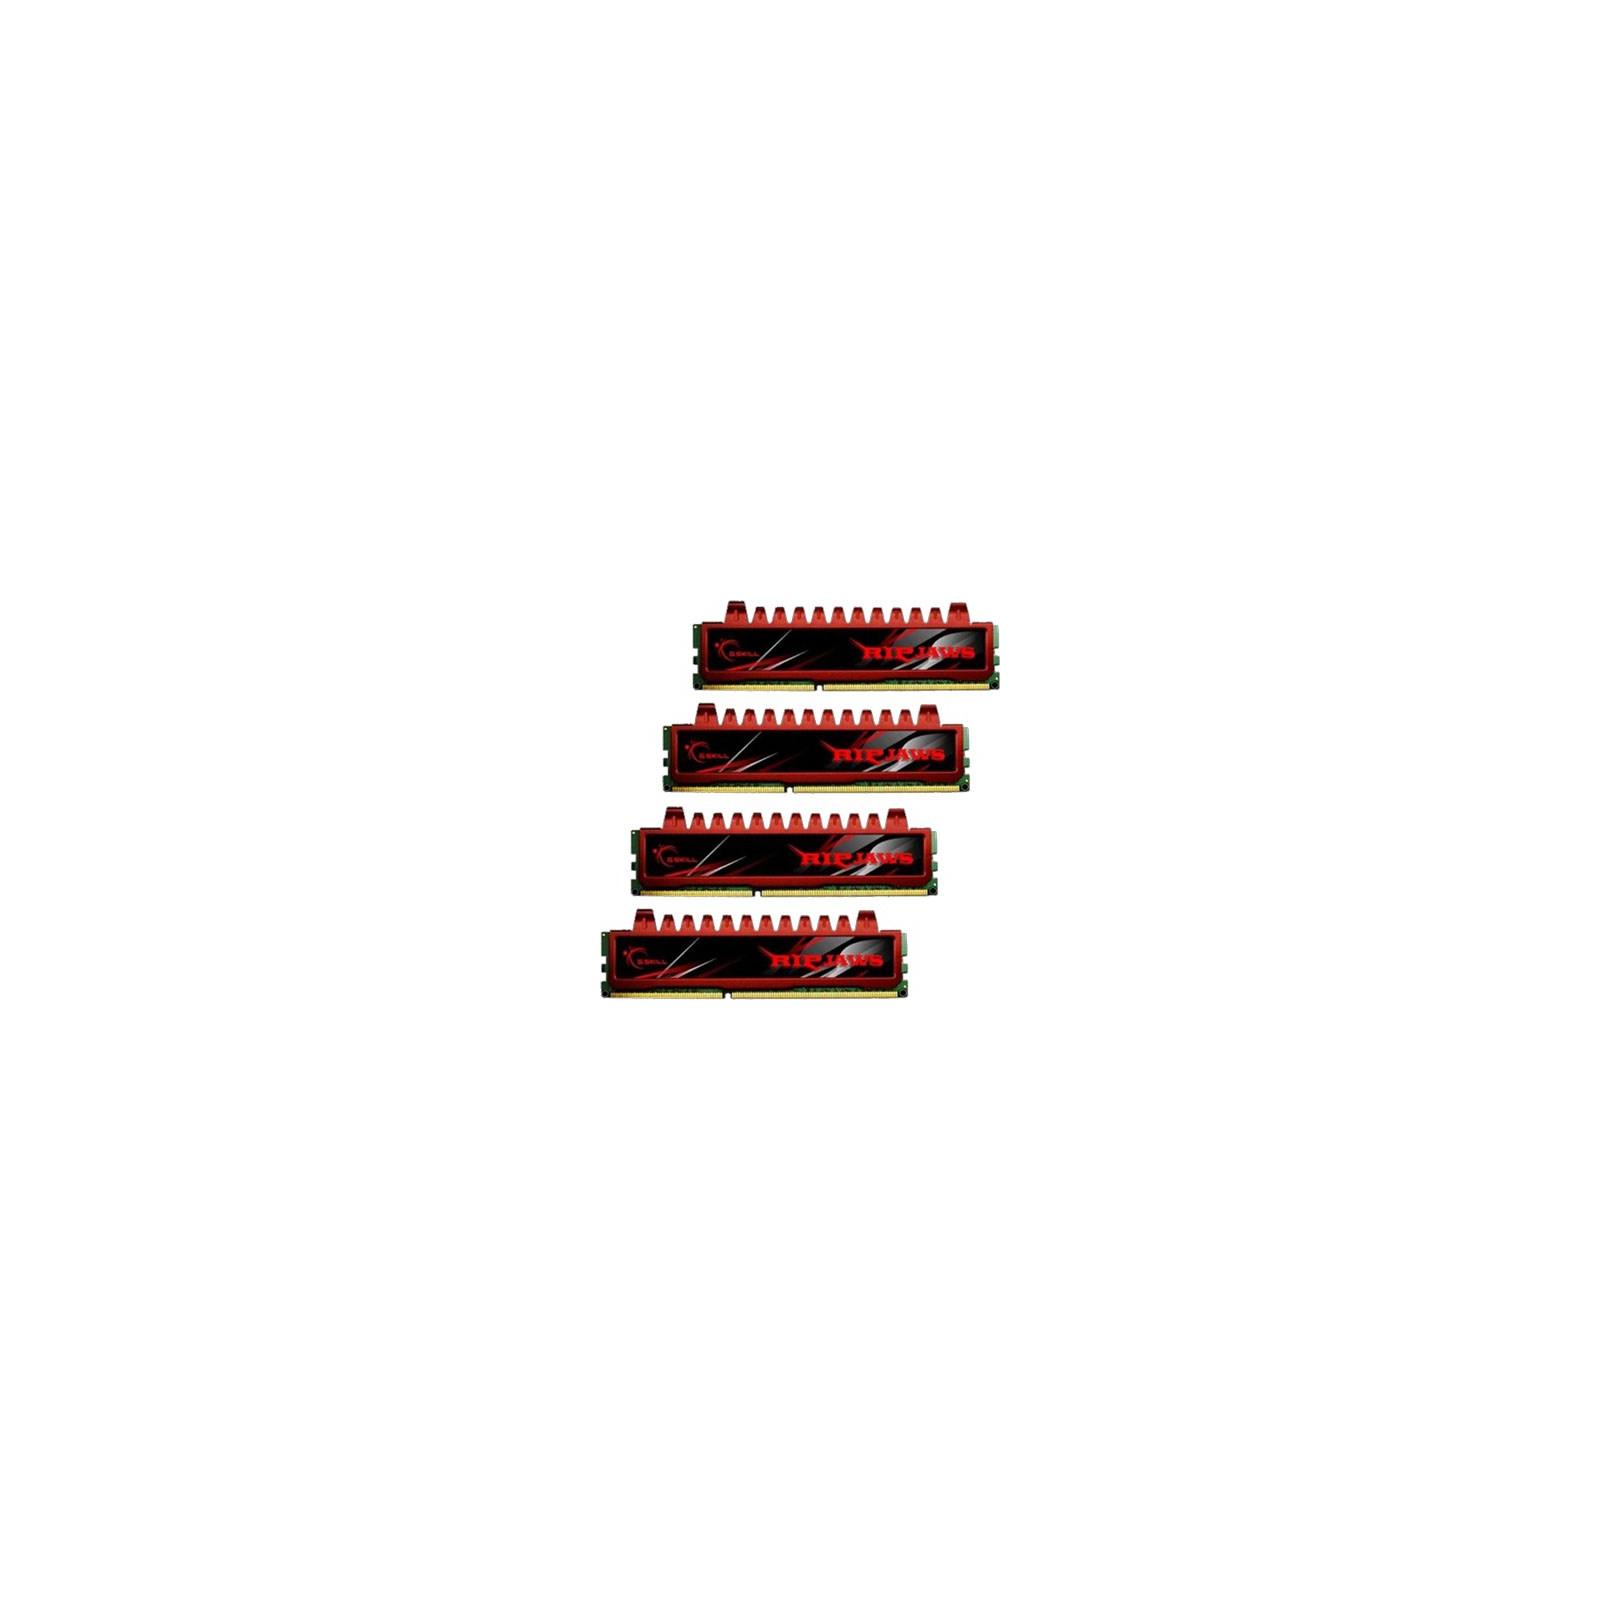 Модуль памяти для компьютера DDR3 16GB (4x4GB) 1333 MHz G.Skill (F3-10666CL9Q-16GBRL)